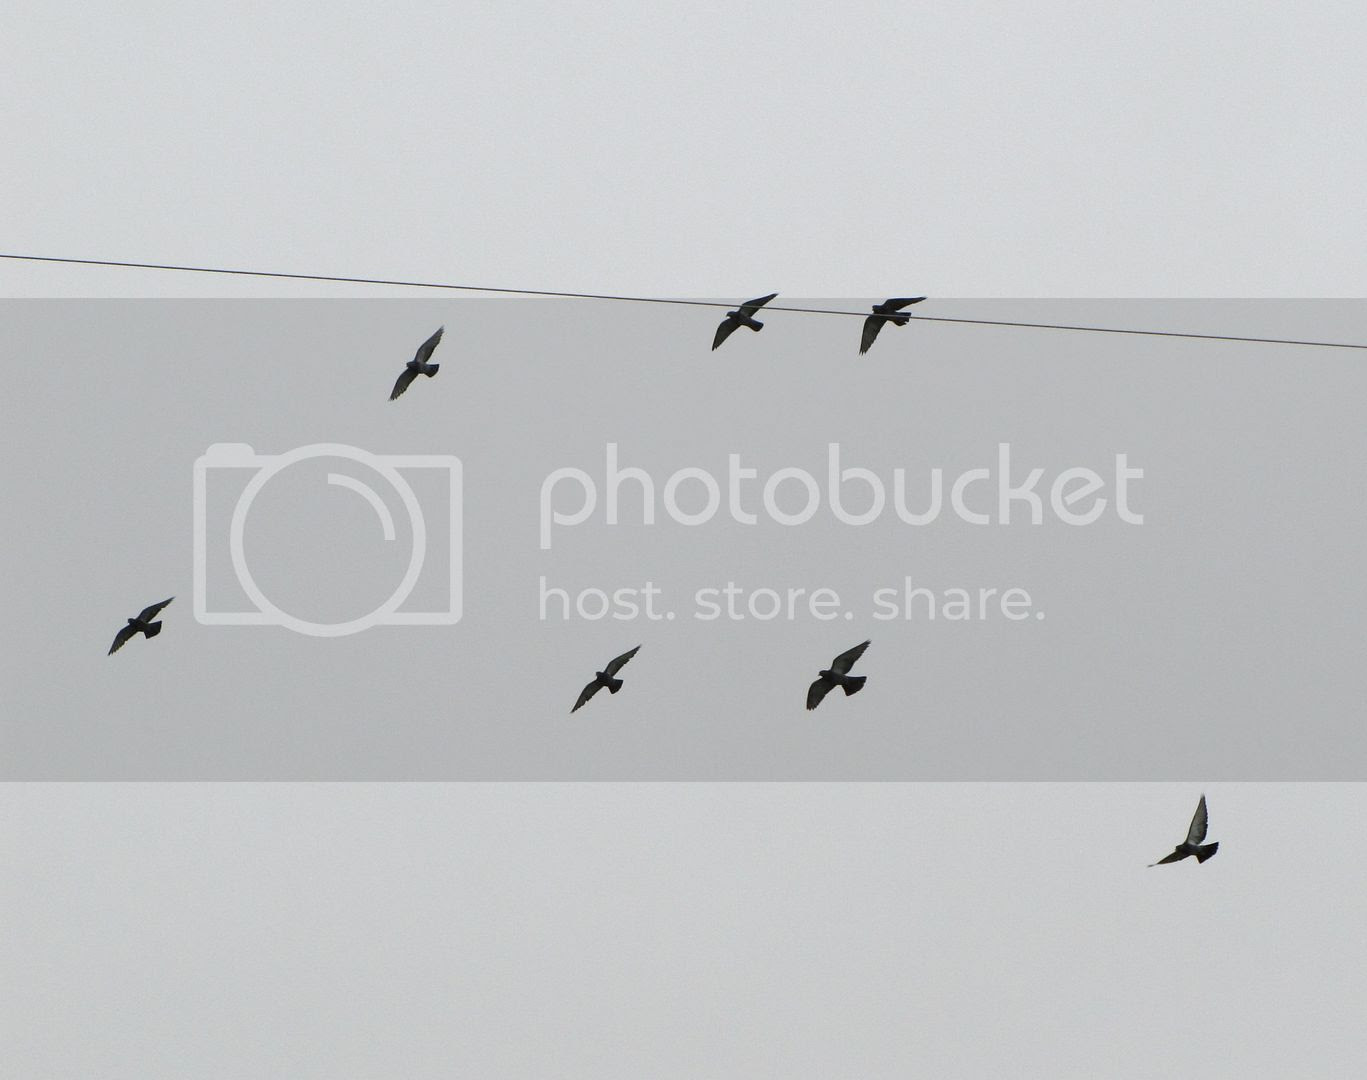 photo 56ad3d68-2ed5-461c-a493-1d7ba16a651d.jpg